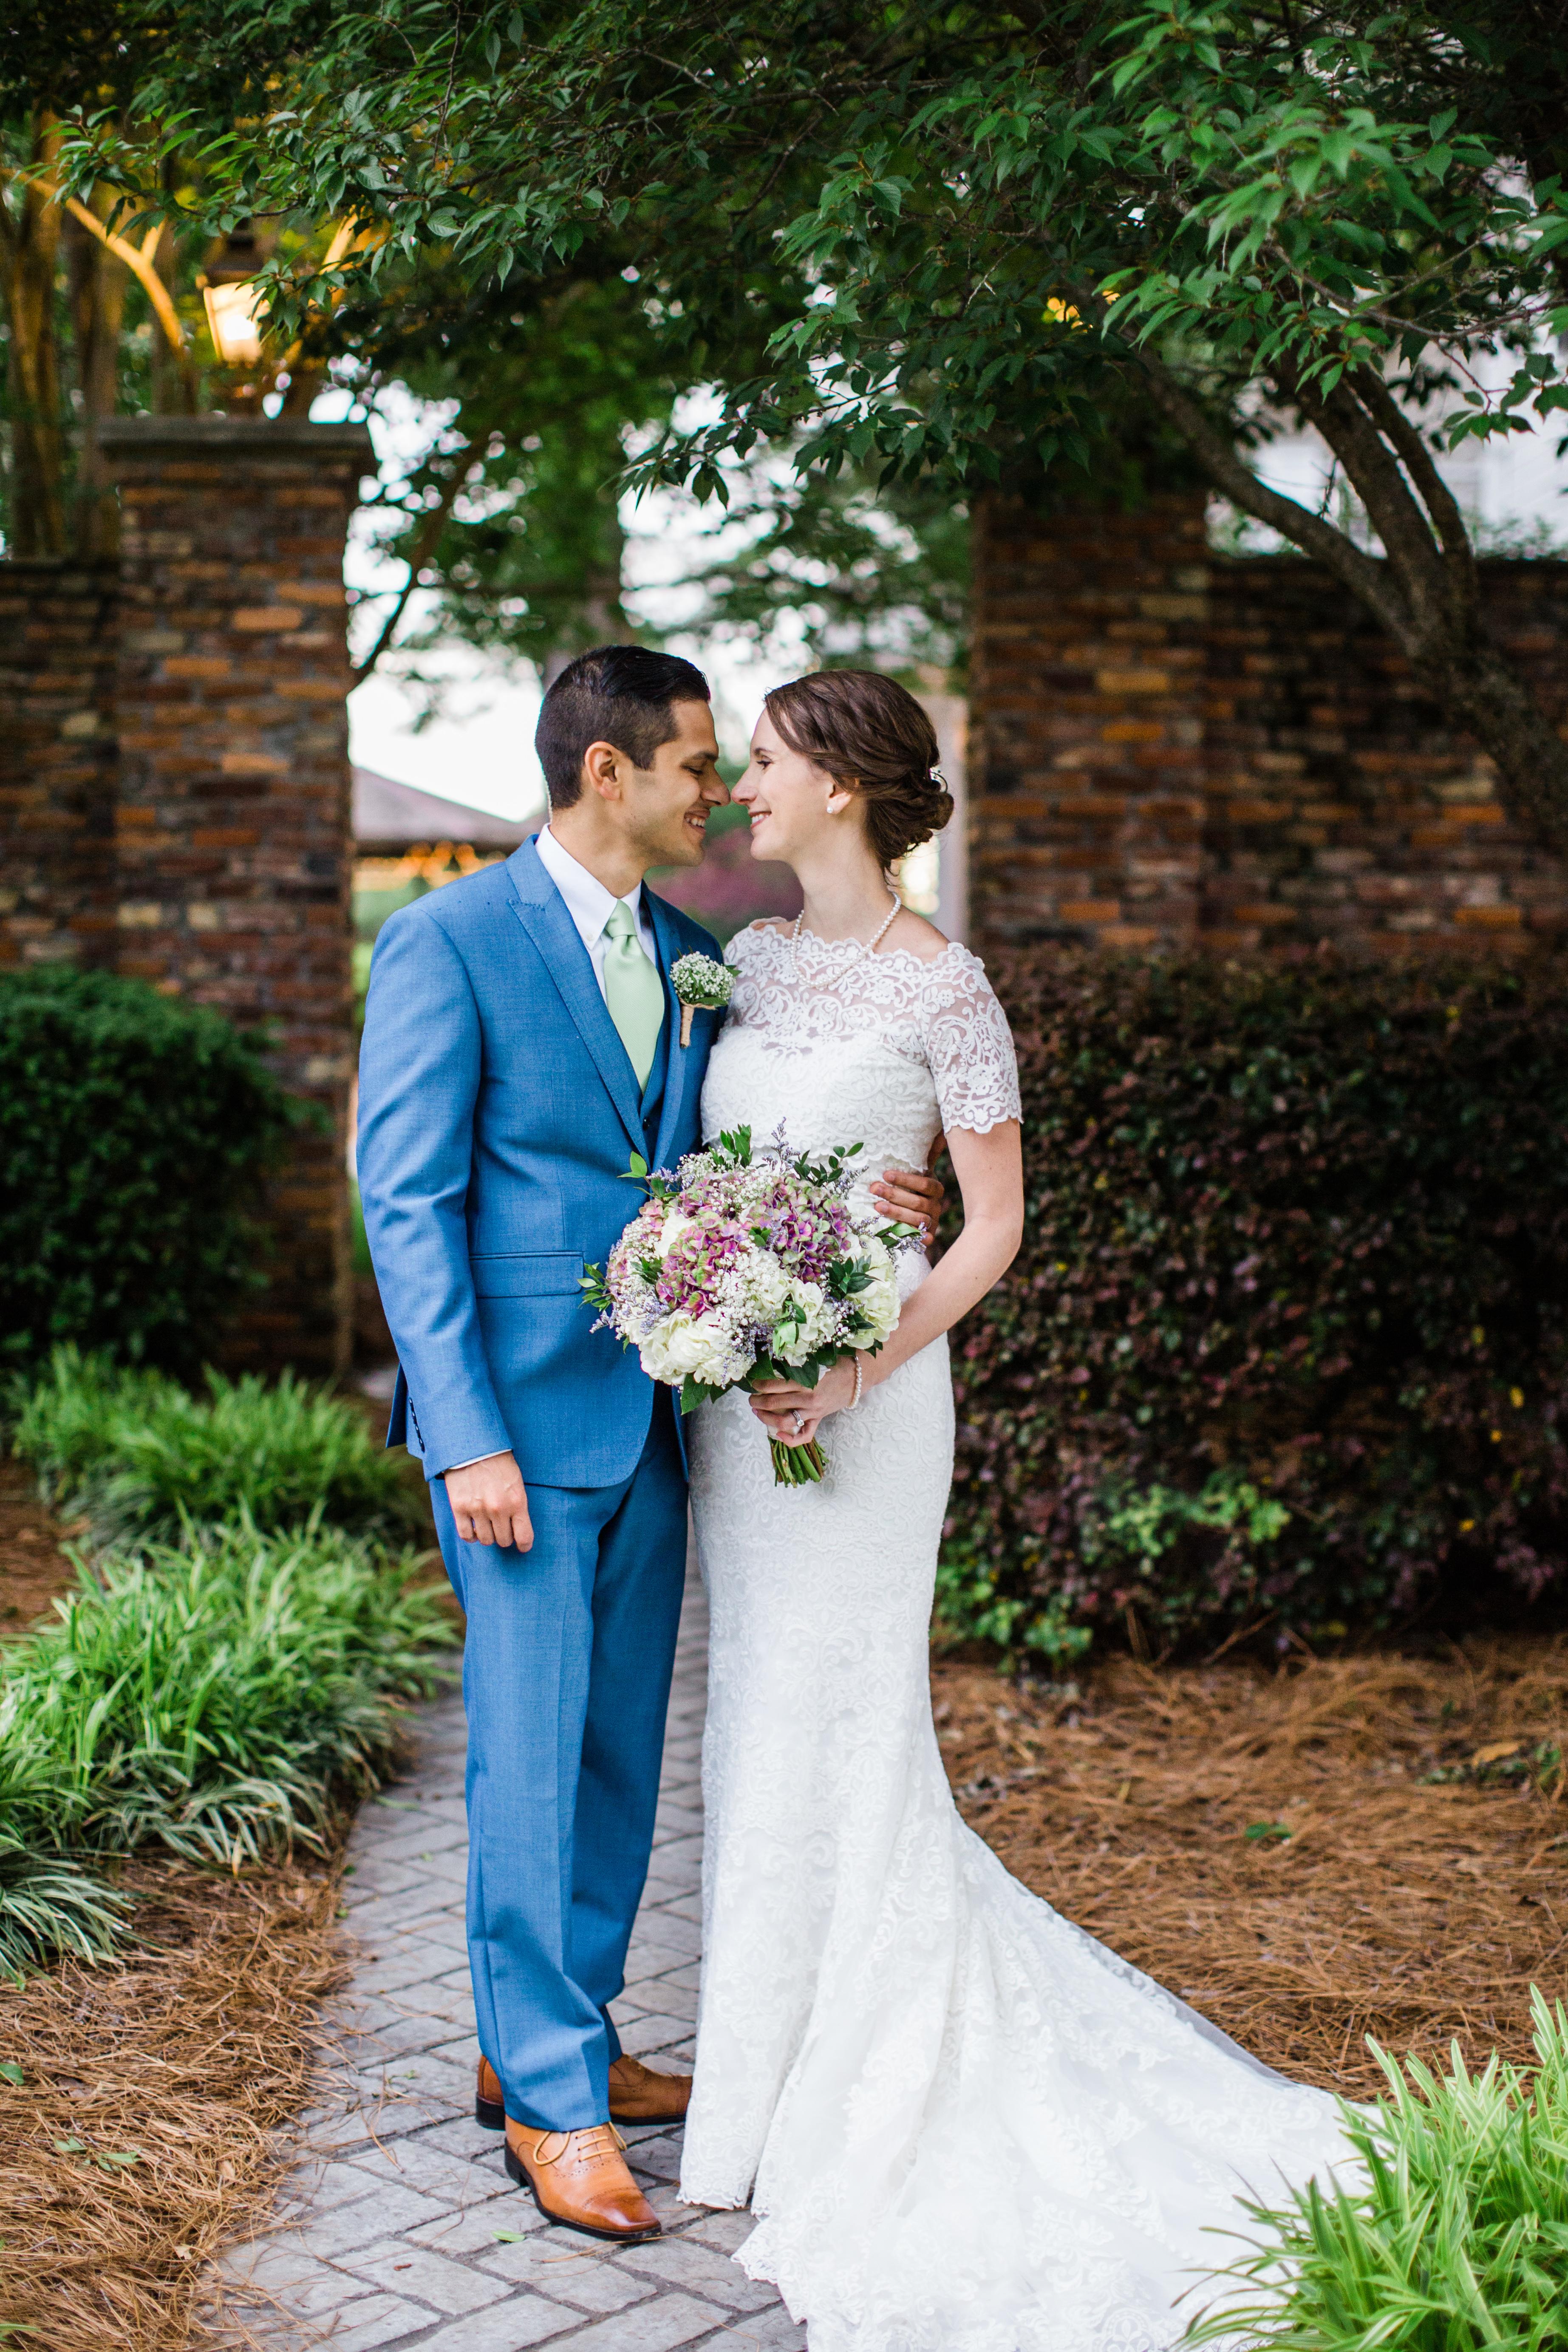 Asterisk Photo_Glaccum Wedding Preview-21